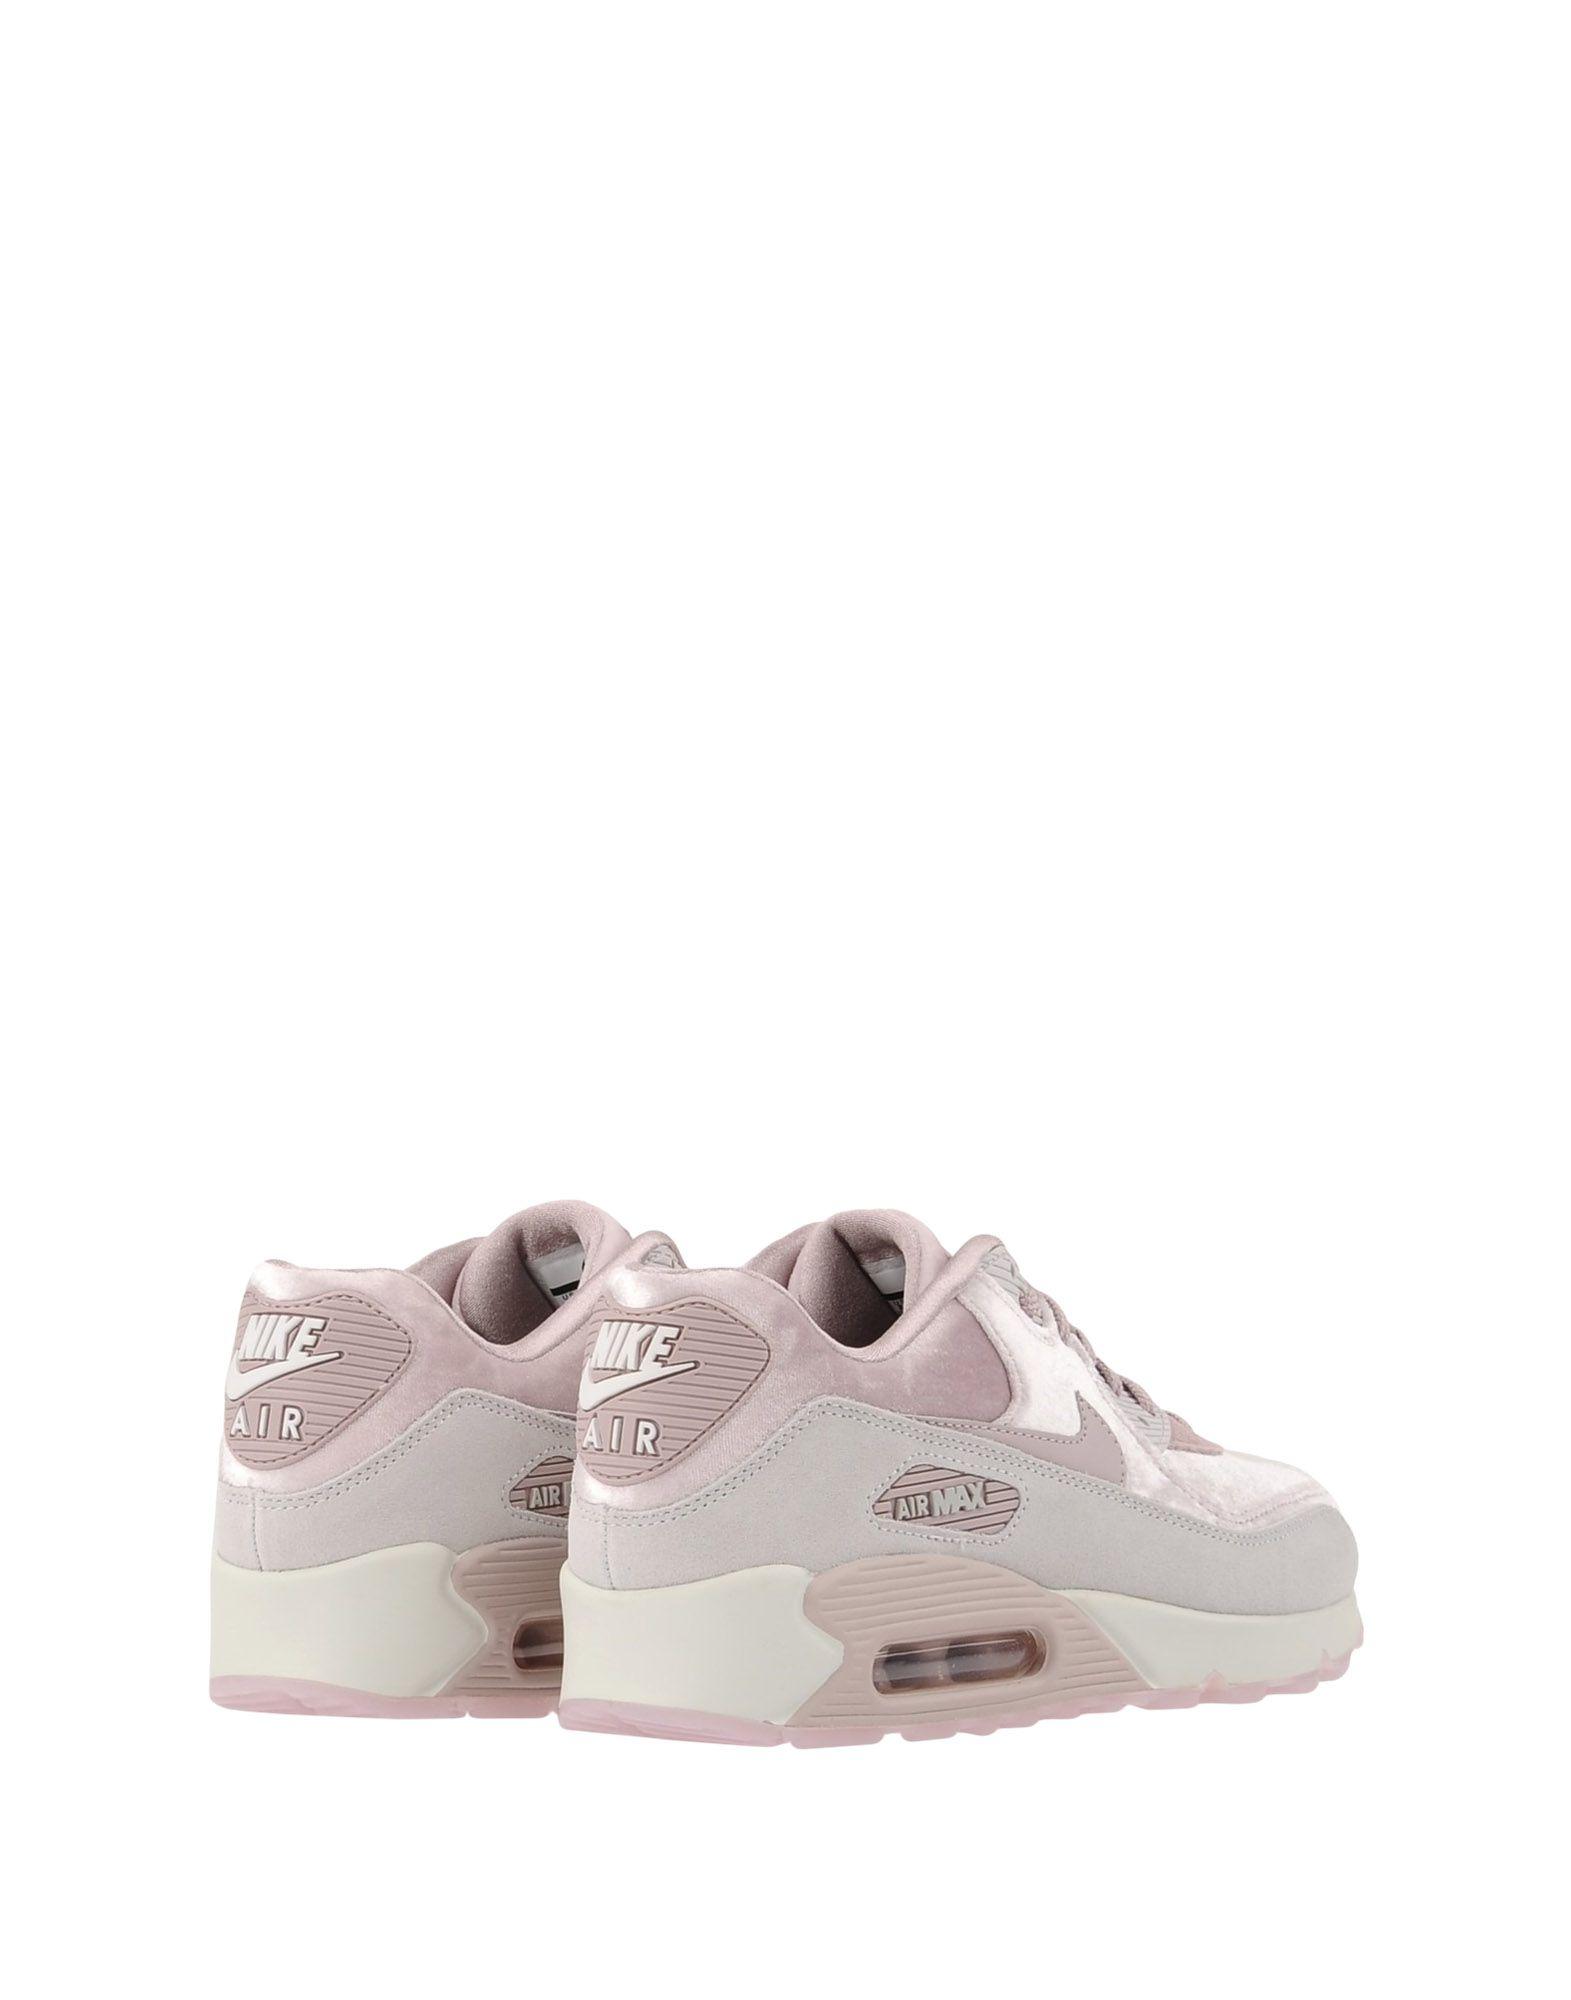 Nike   Air Max 90 Lux   11452719TF Gute Qualität beliebte Schuhe 764e2d